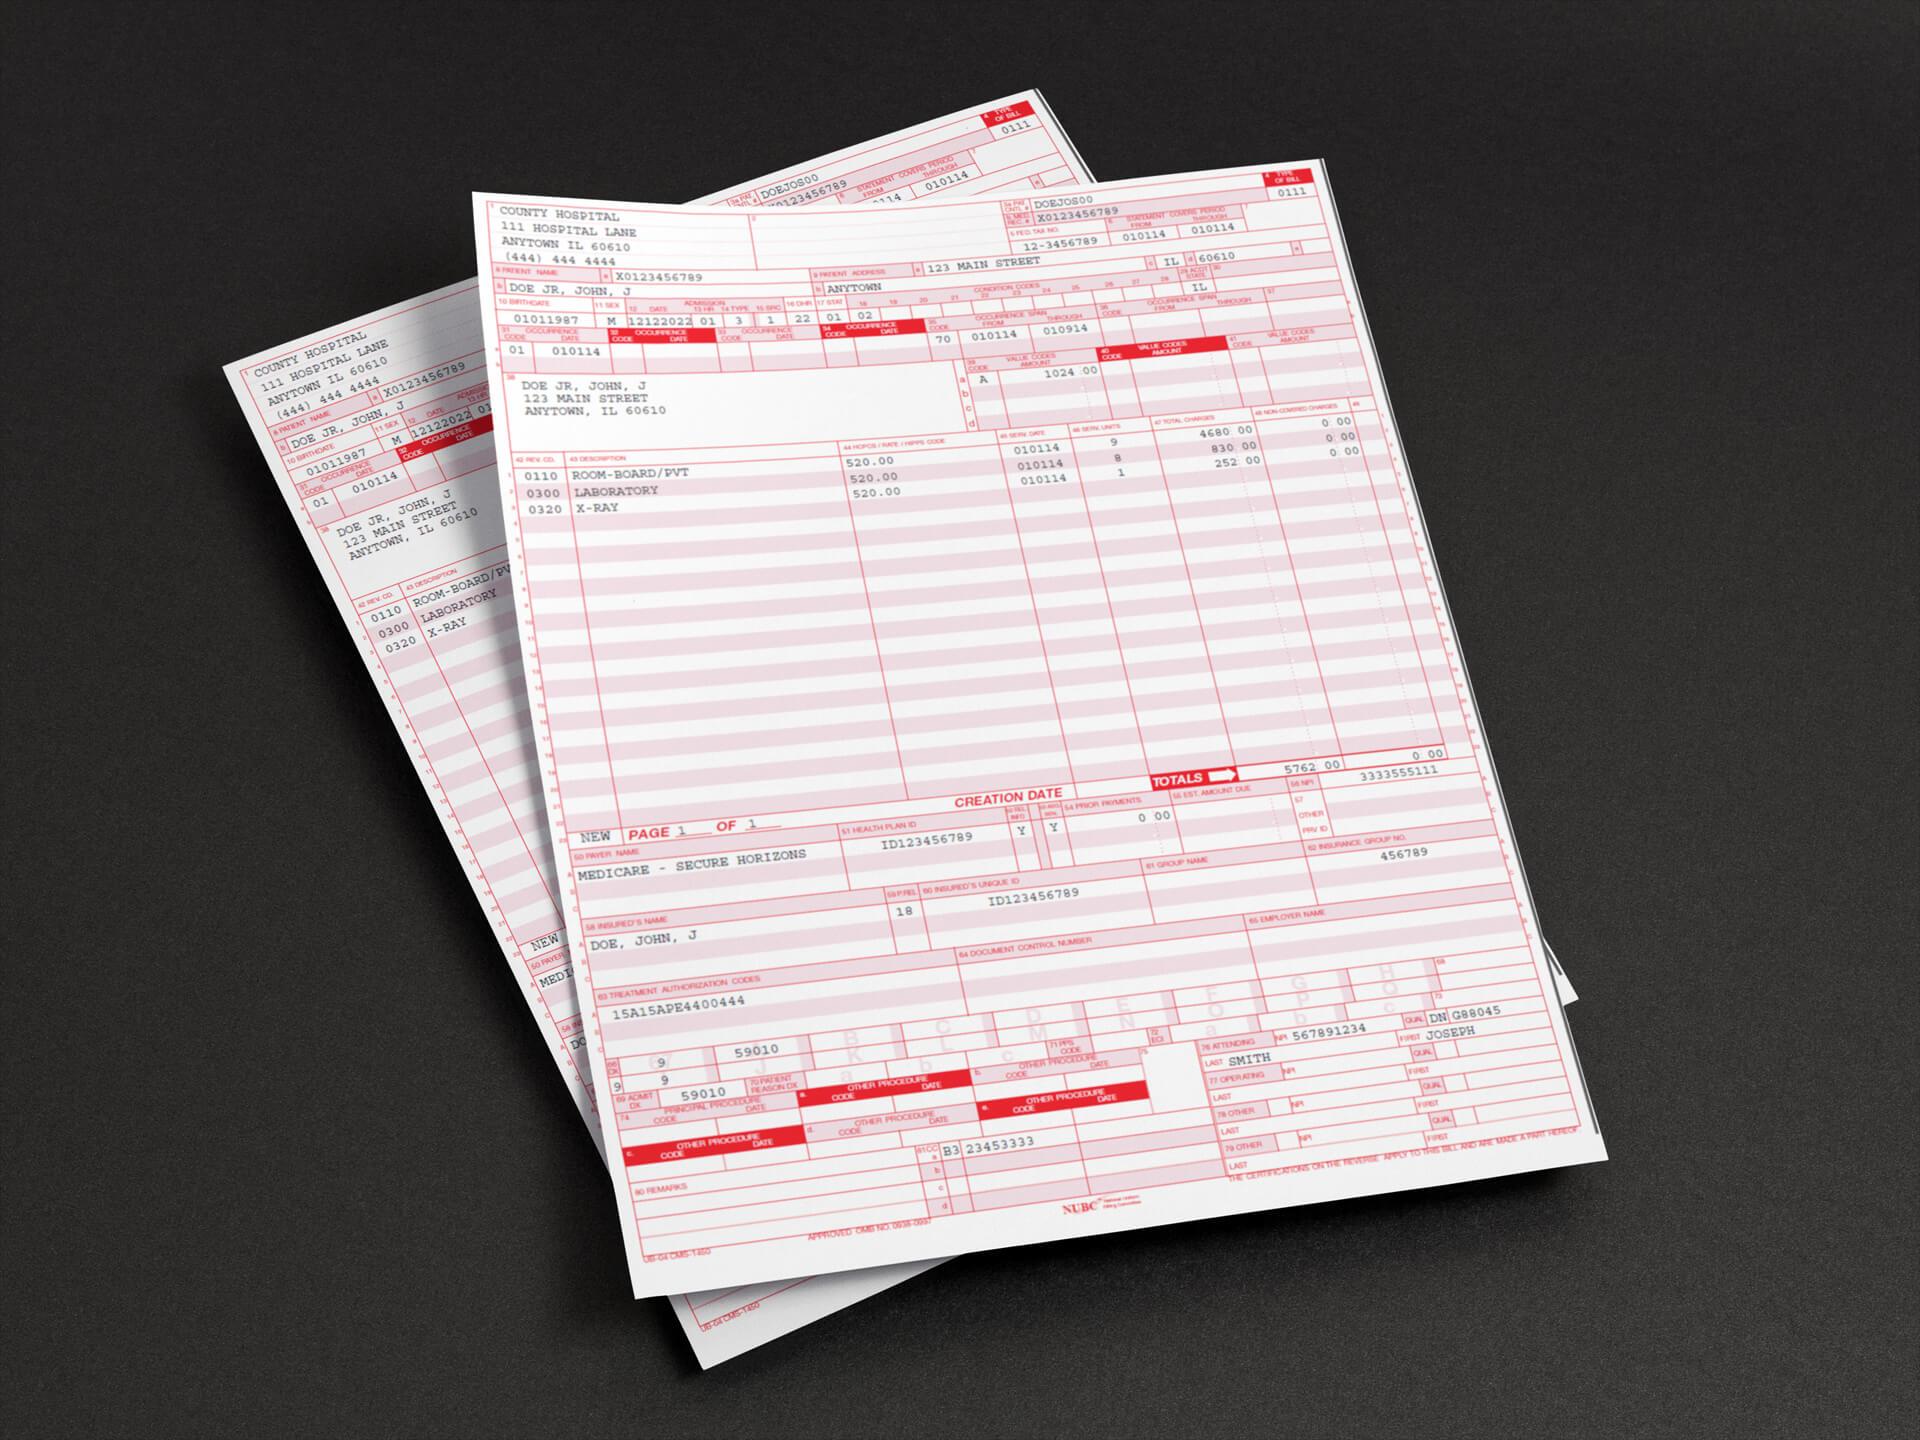 Ub 04 Paper Claim